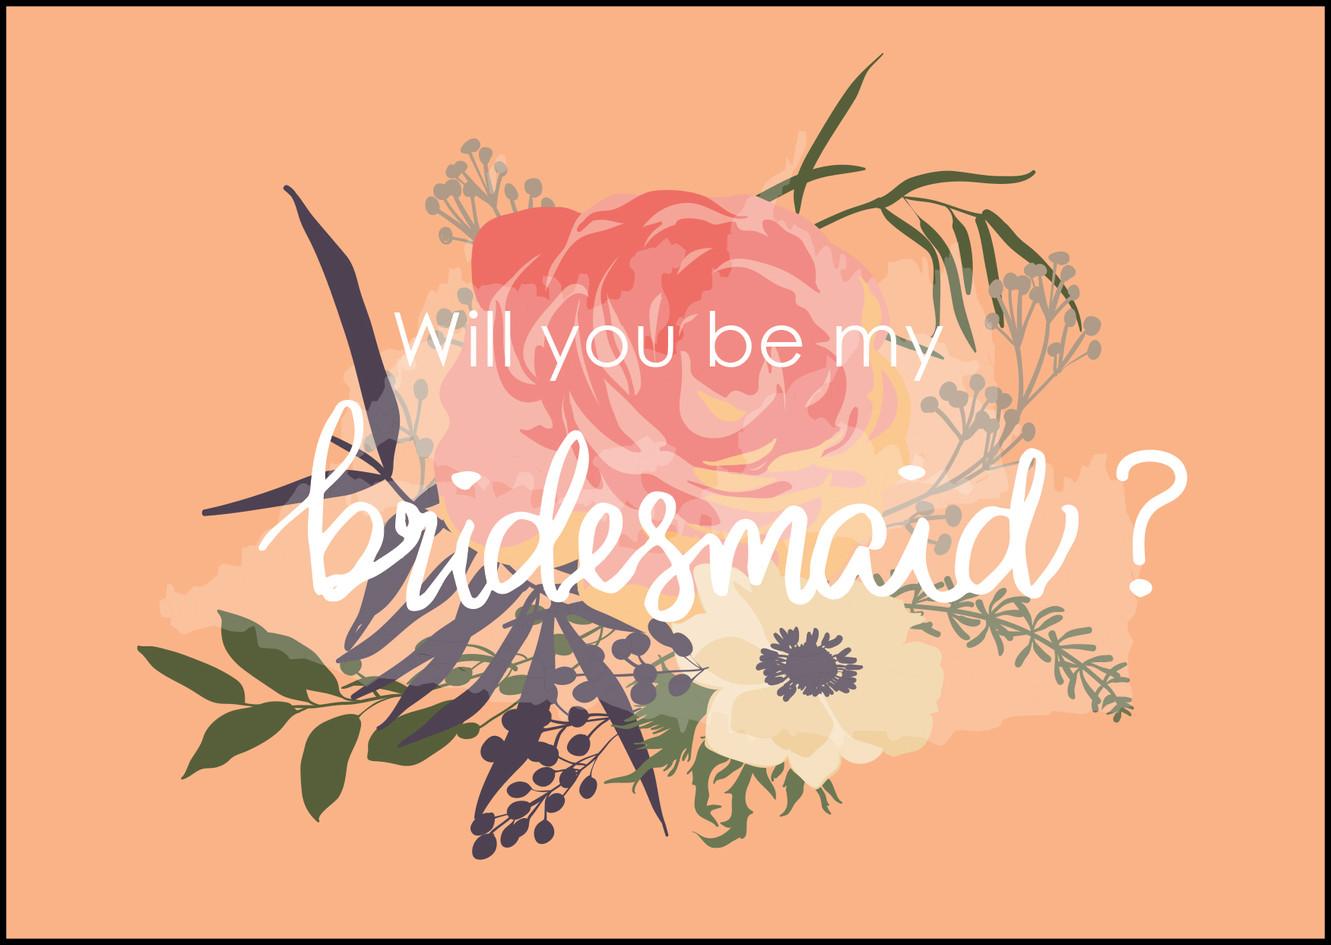 Bridesmaid-5.jpg